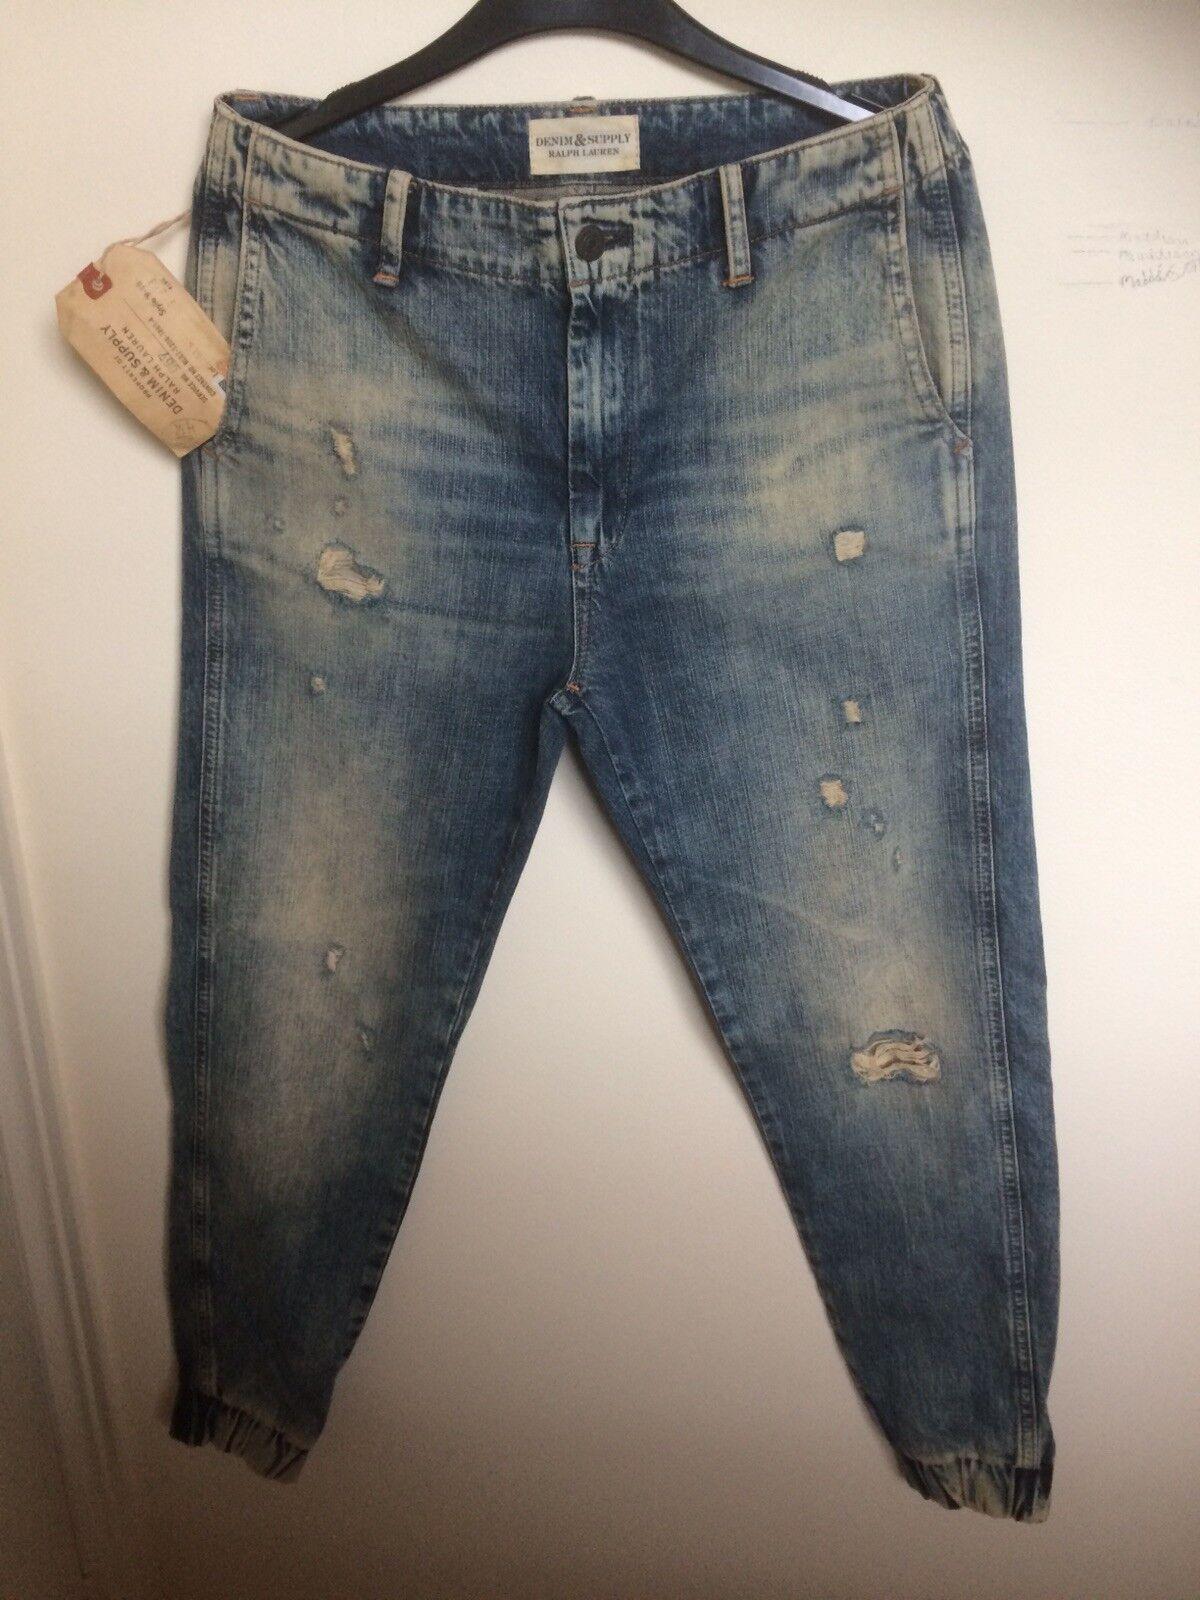 Ralph Lauren Denim & Supply, bluee Jeans, Distressed, Womens Size 24 UK